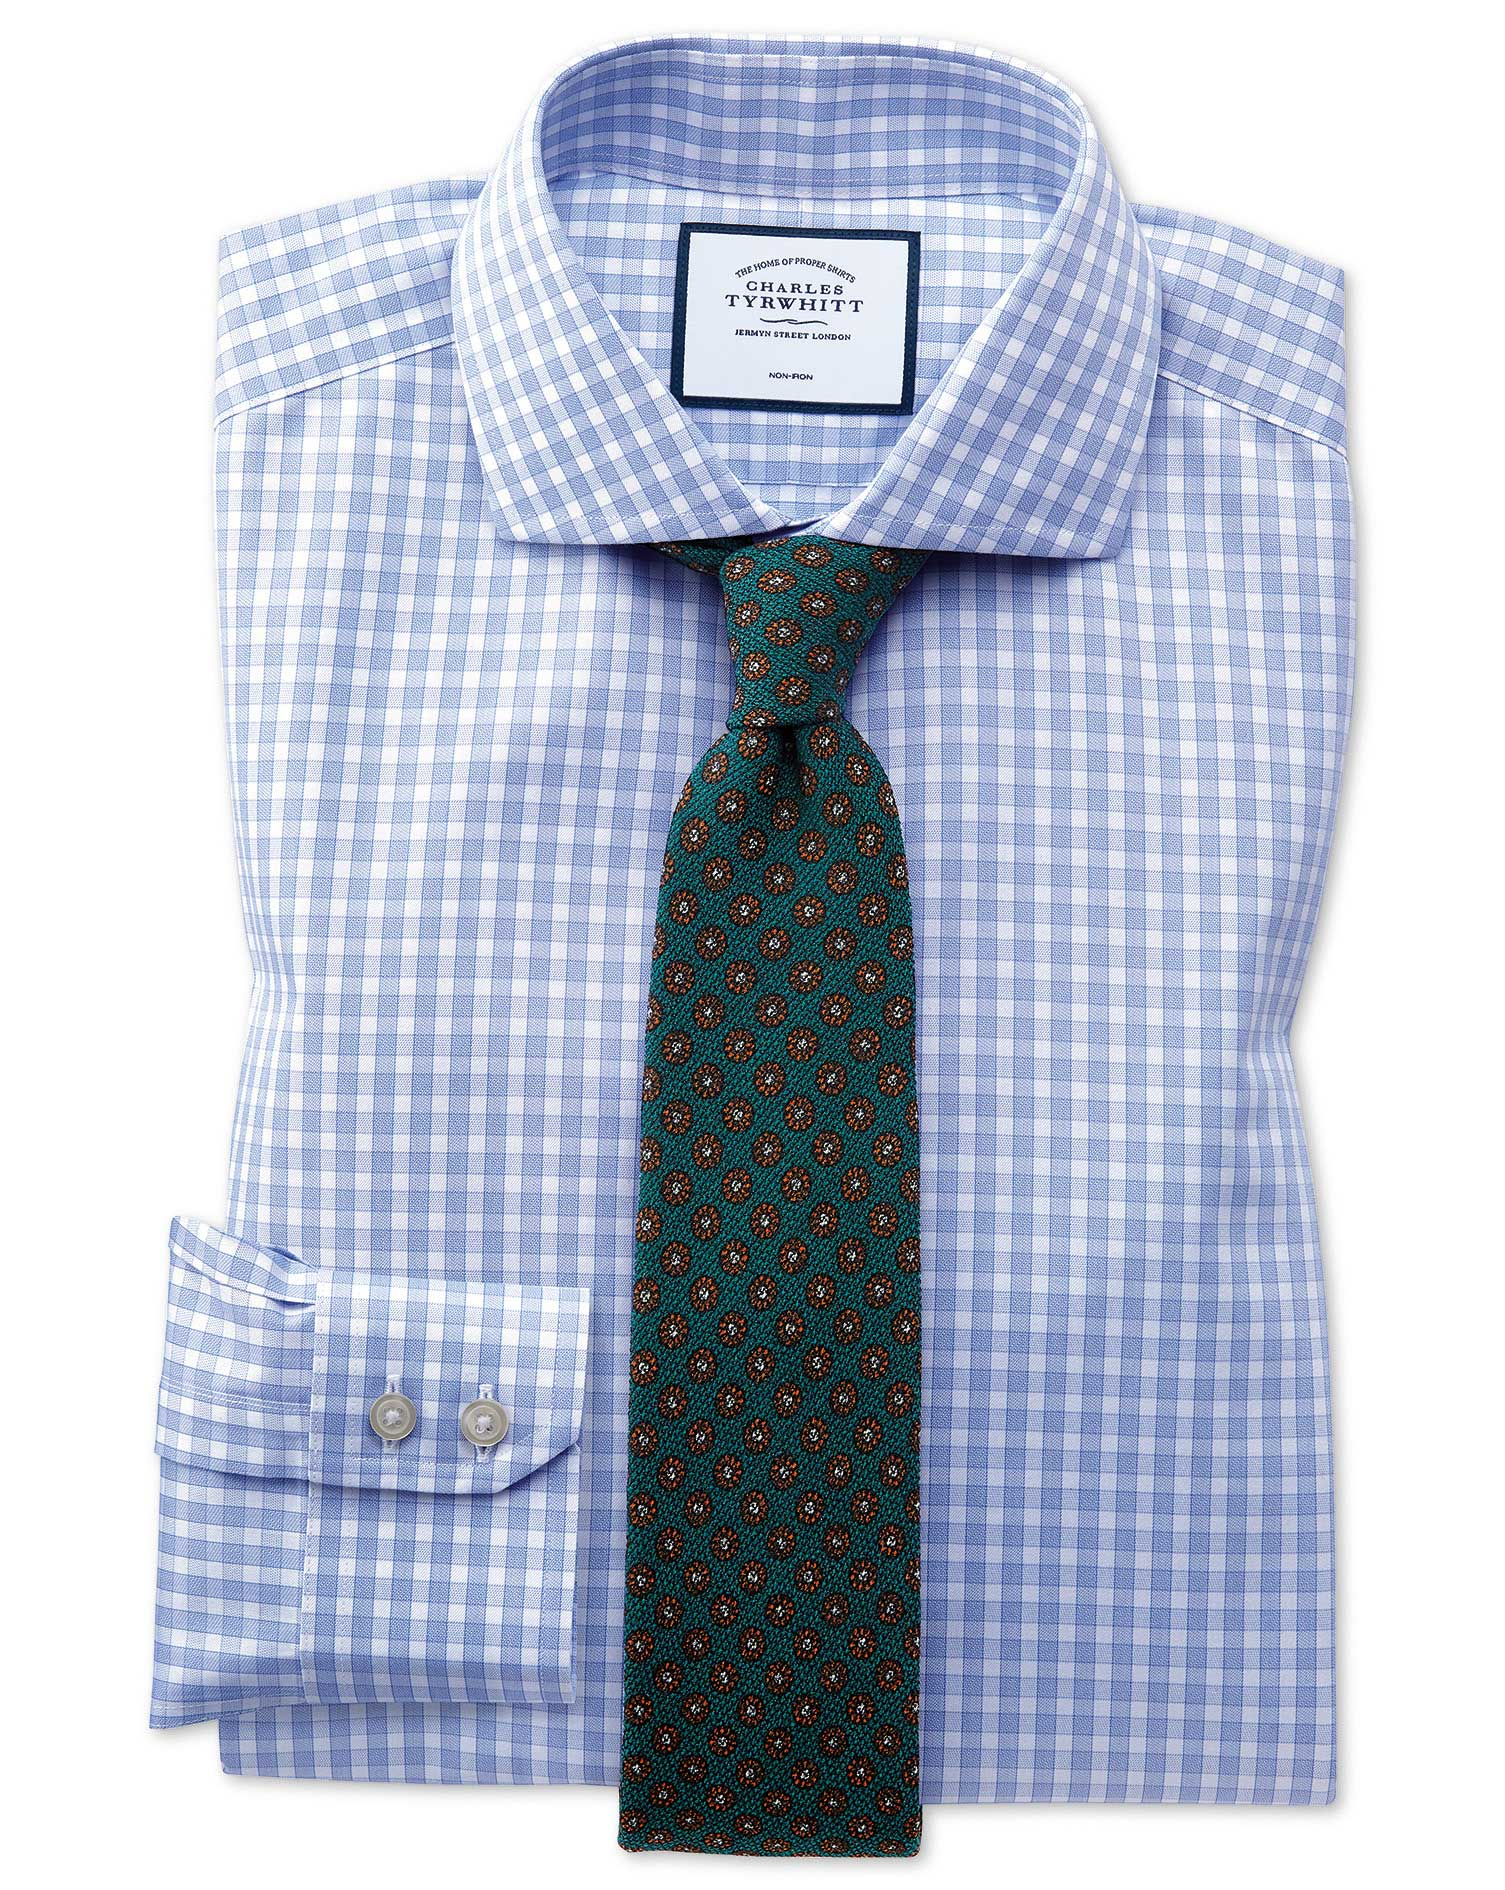 18a637f8 Slim fit non-iron twill gingham sky blue shirt | Charles Tyrwhitt